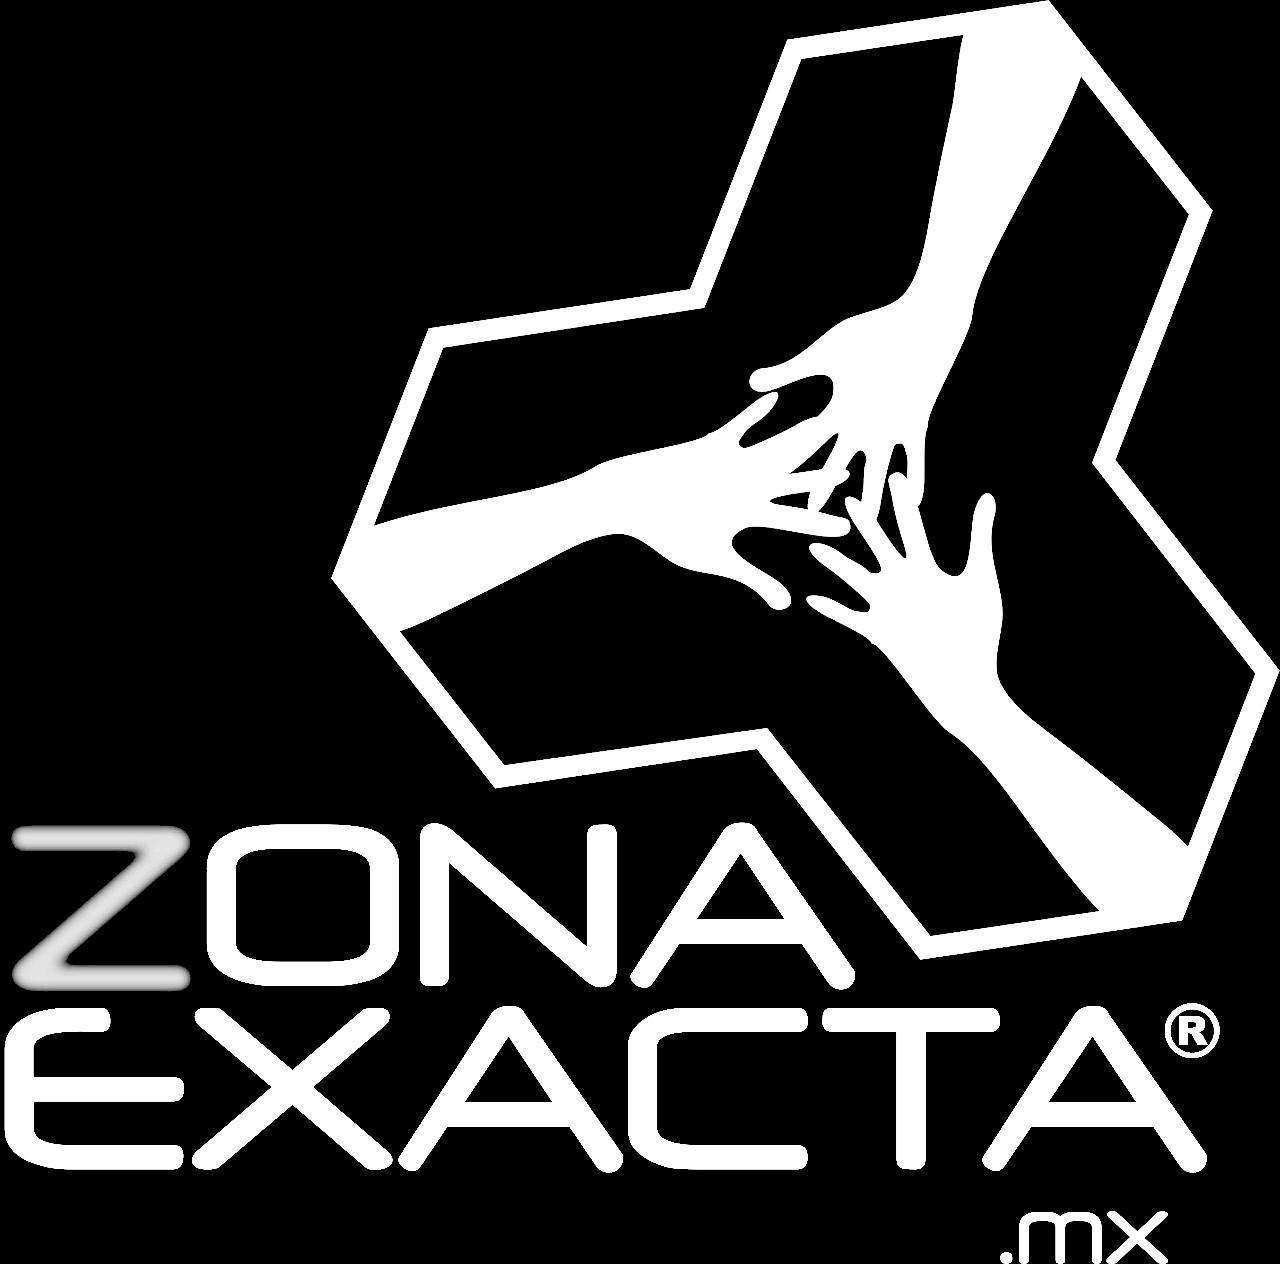 Zona Exacta